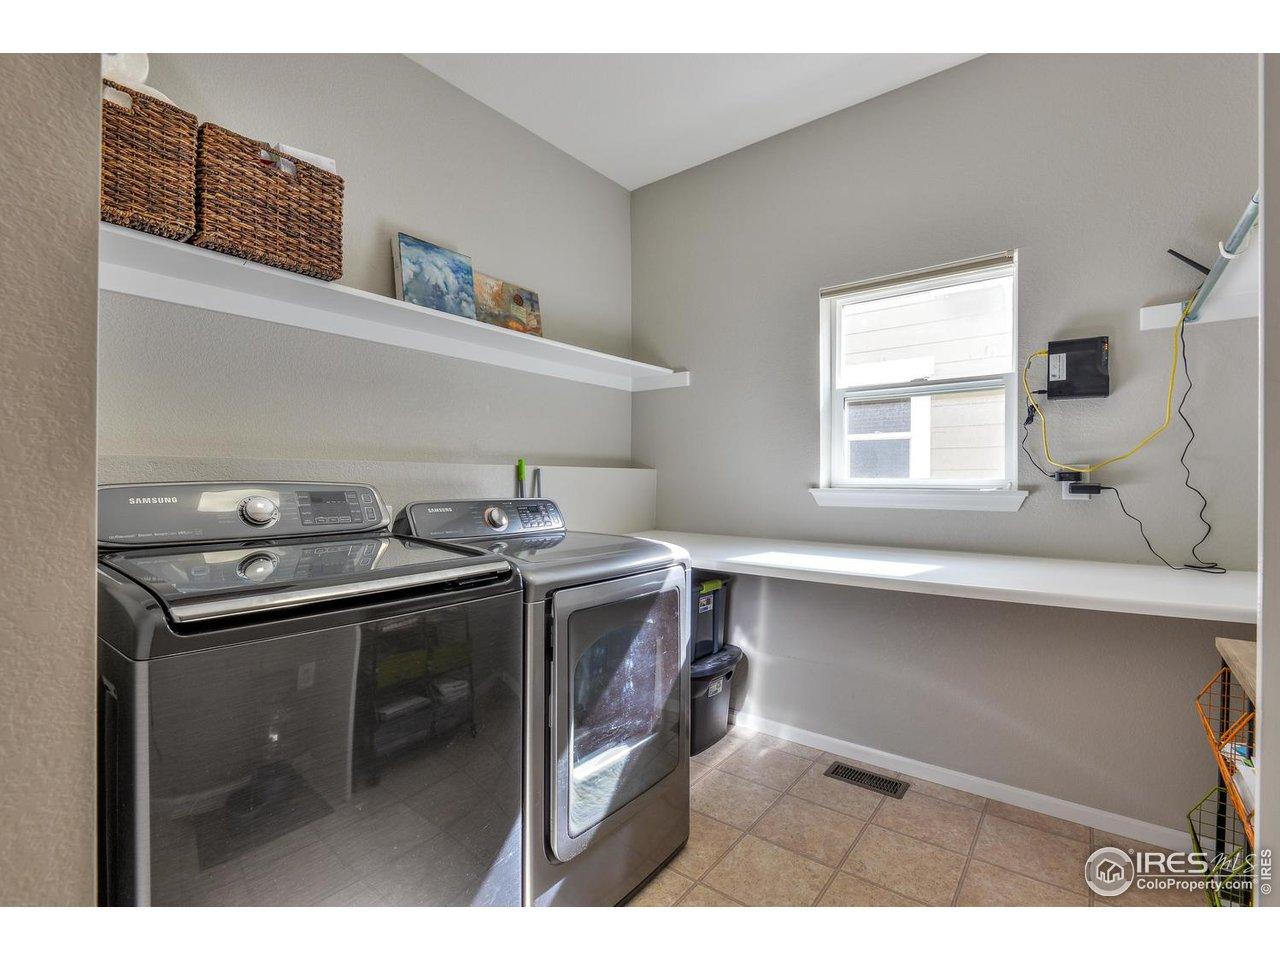 Laundry Room w/ Folding Table